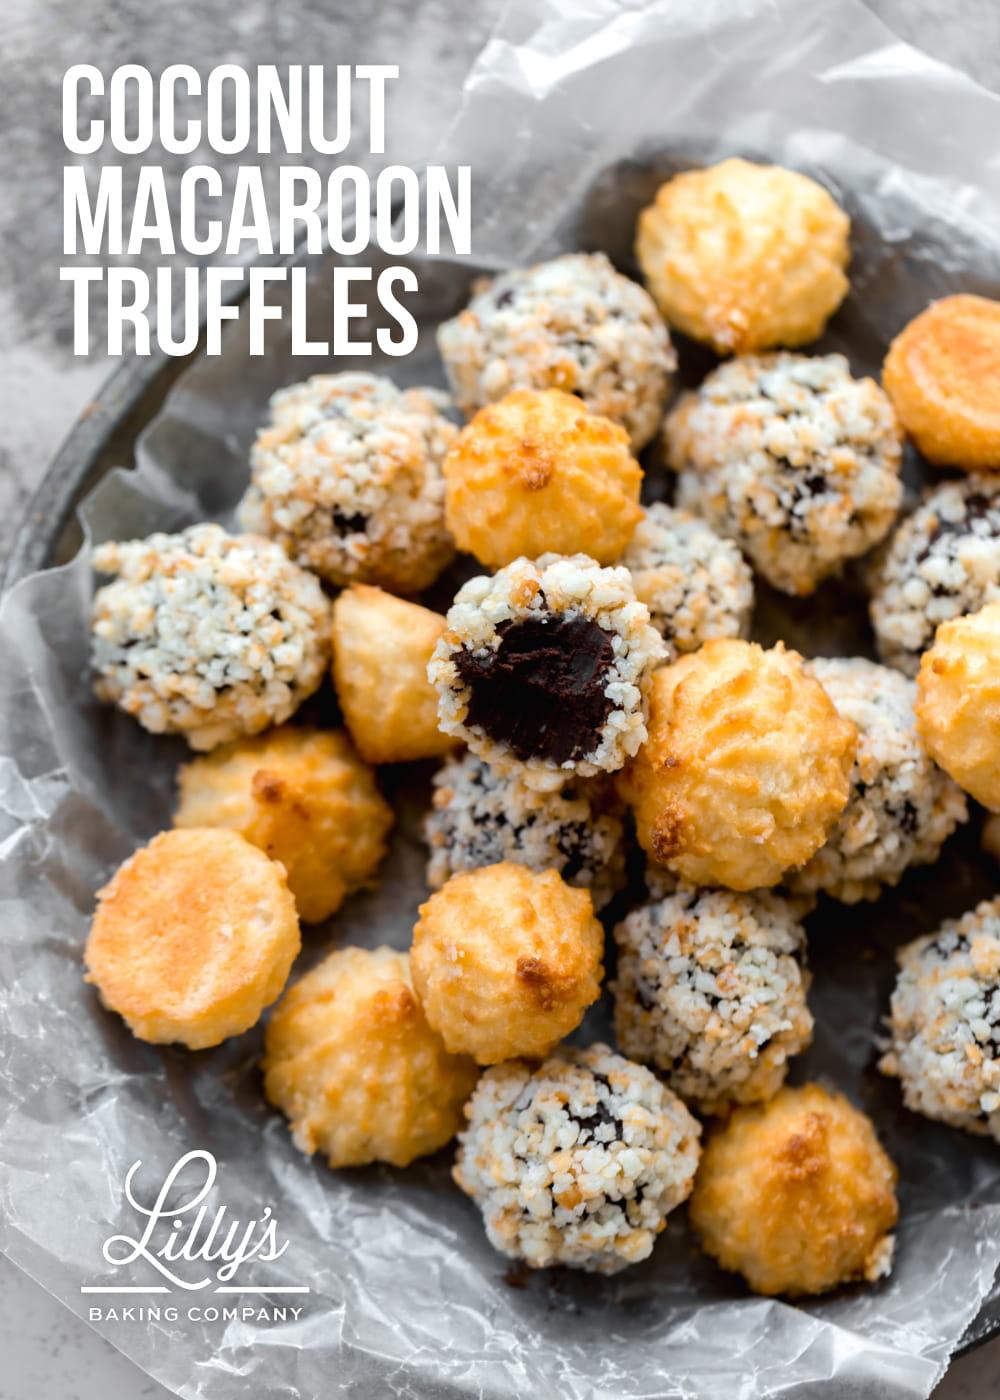 Coconut Macaroon Truffles